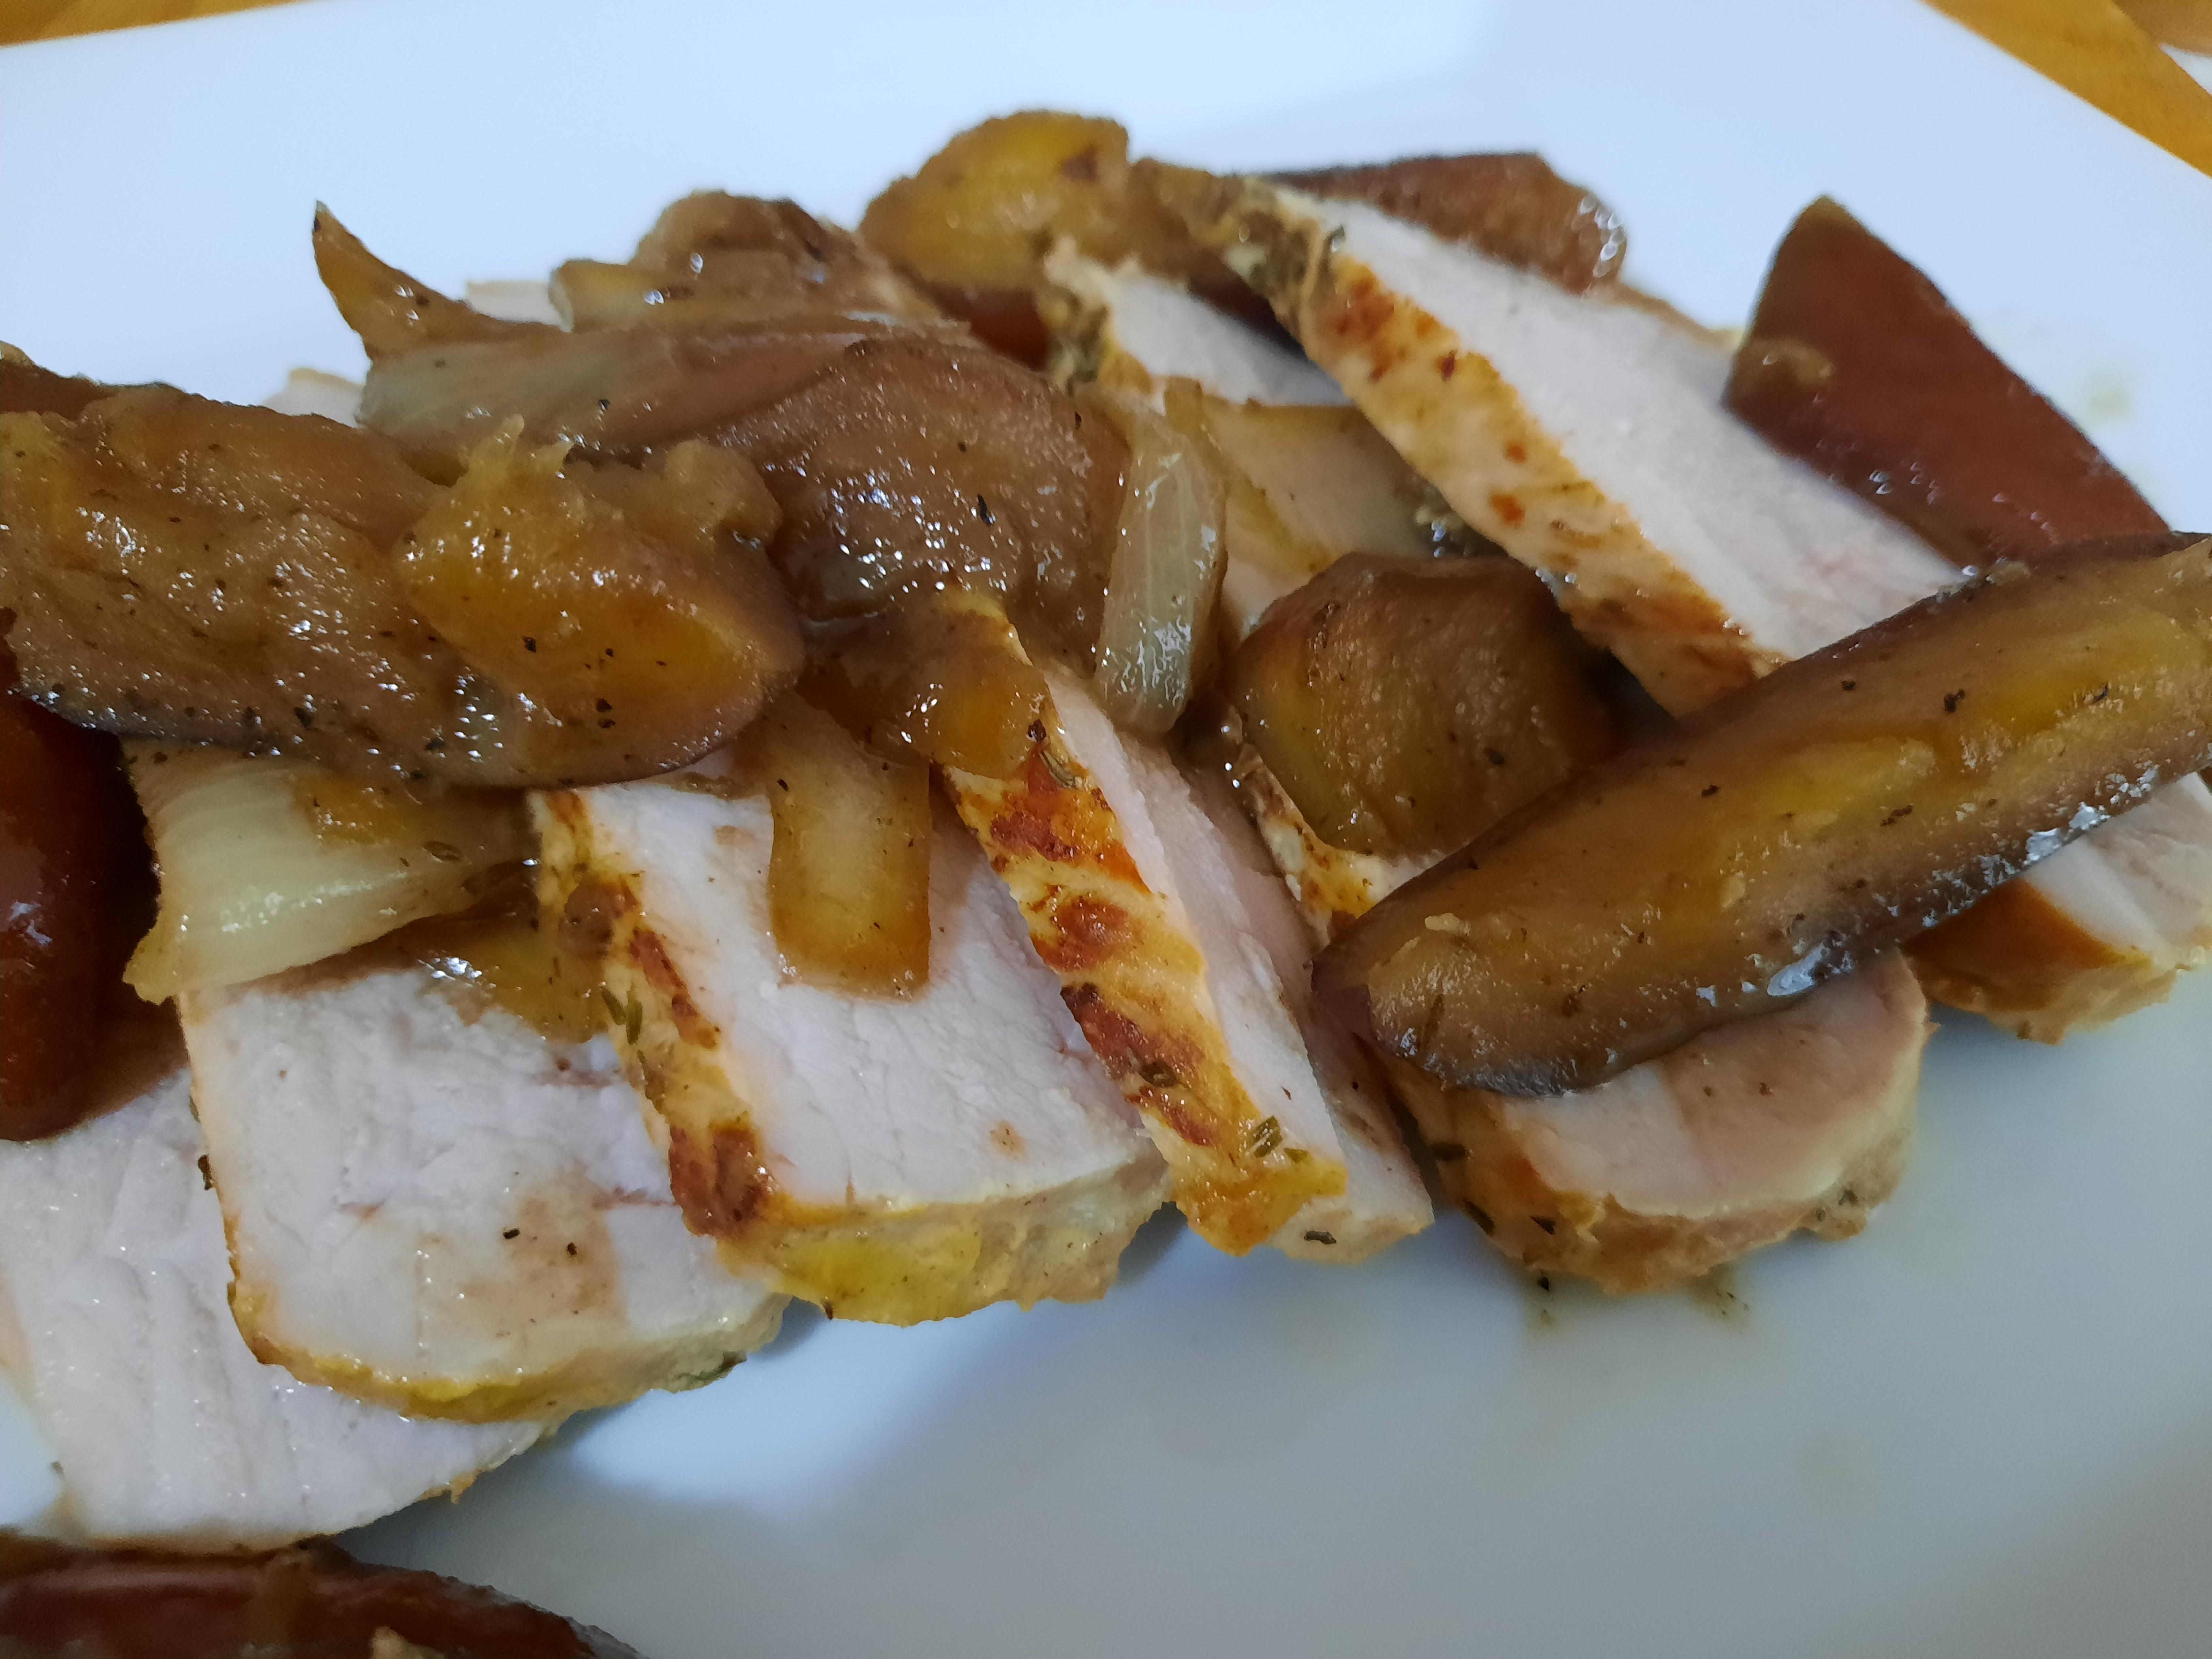 Pork Tenderloin with Apples and Onions Bob Jones